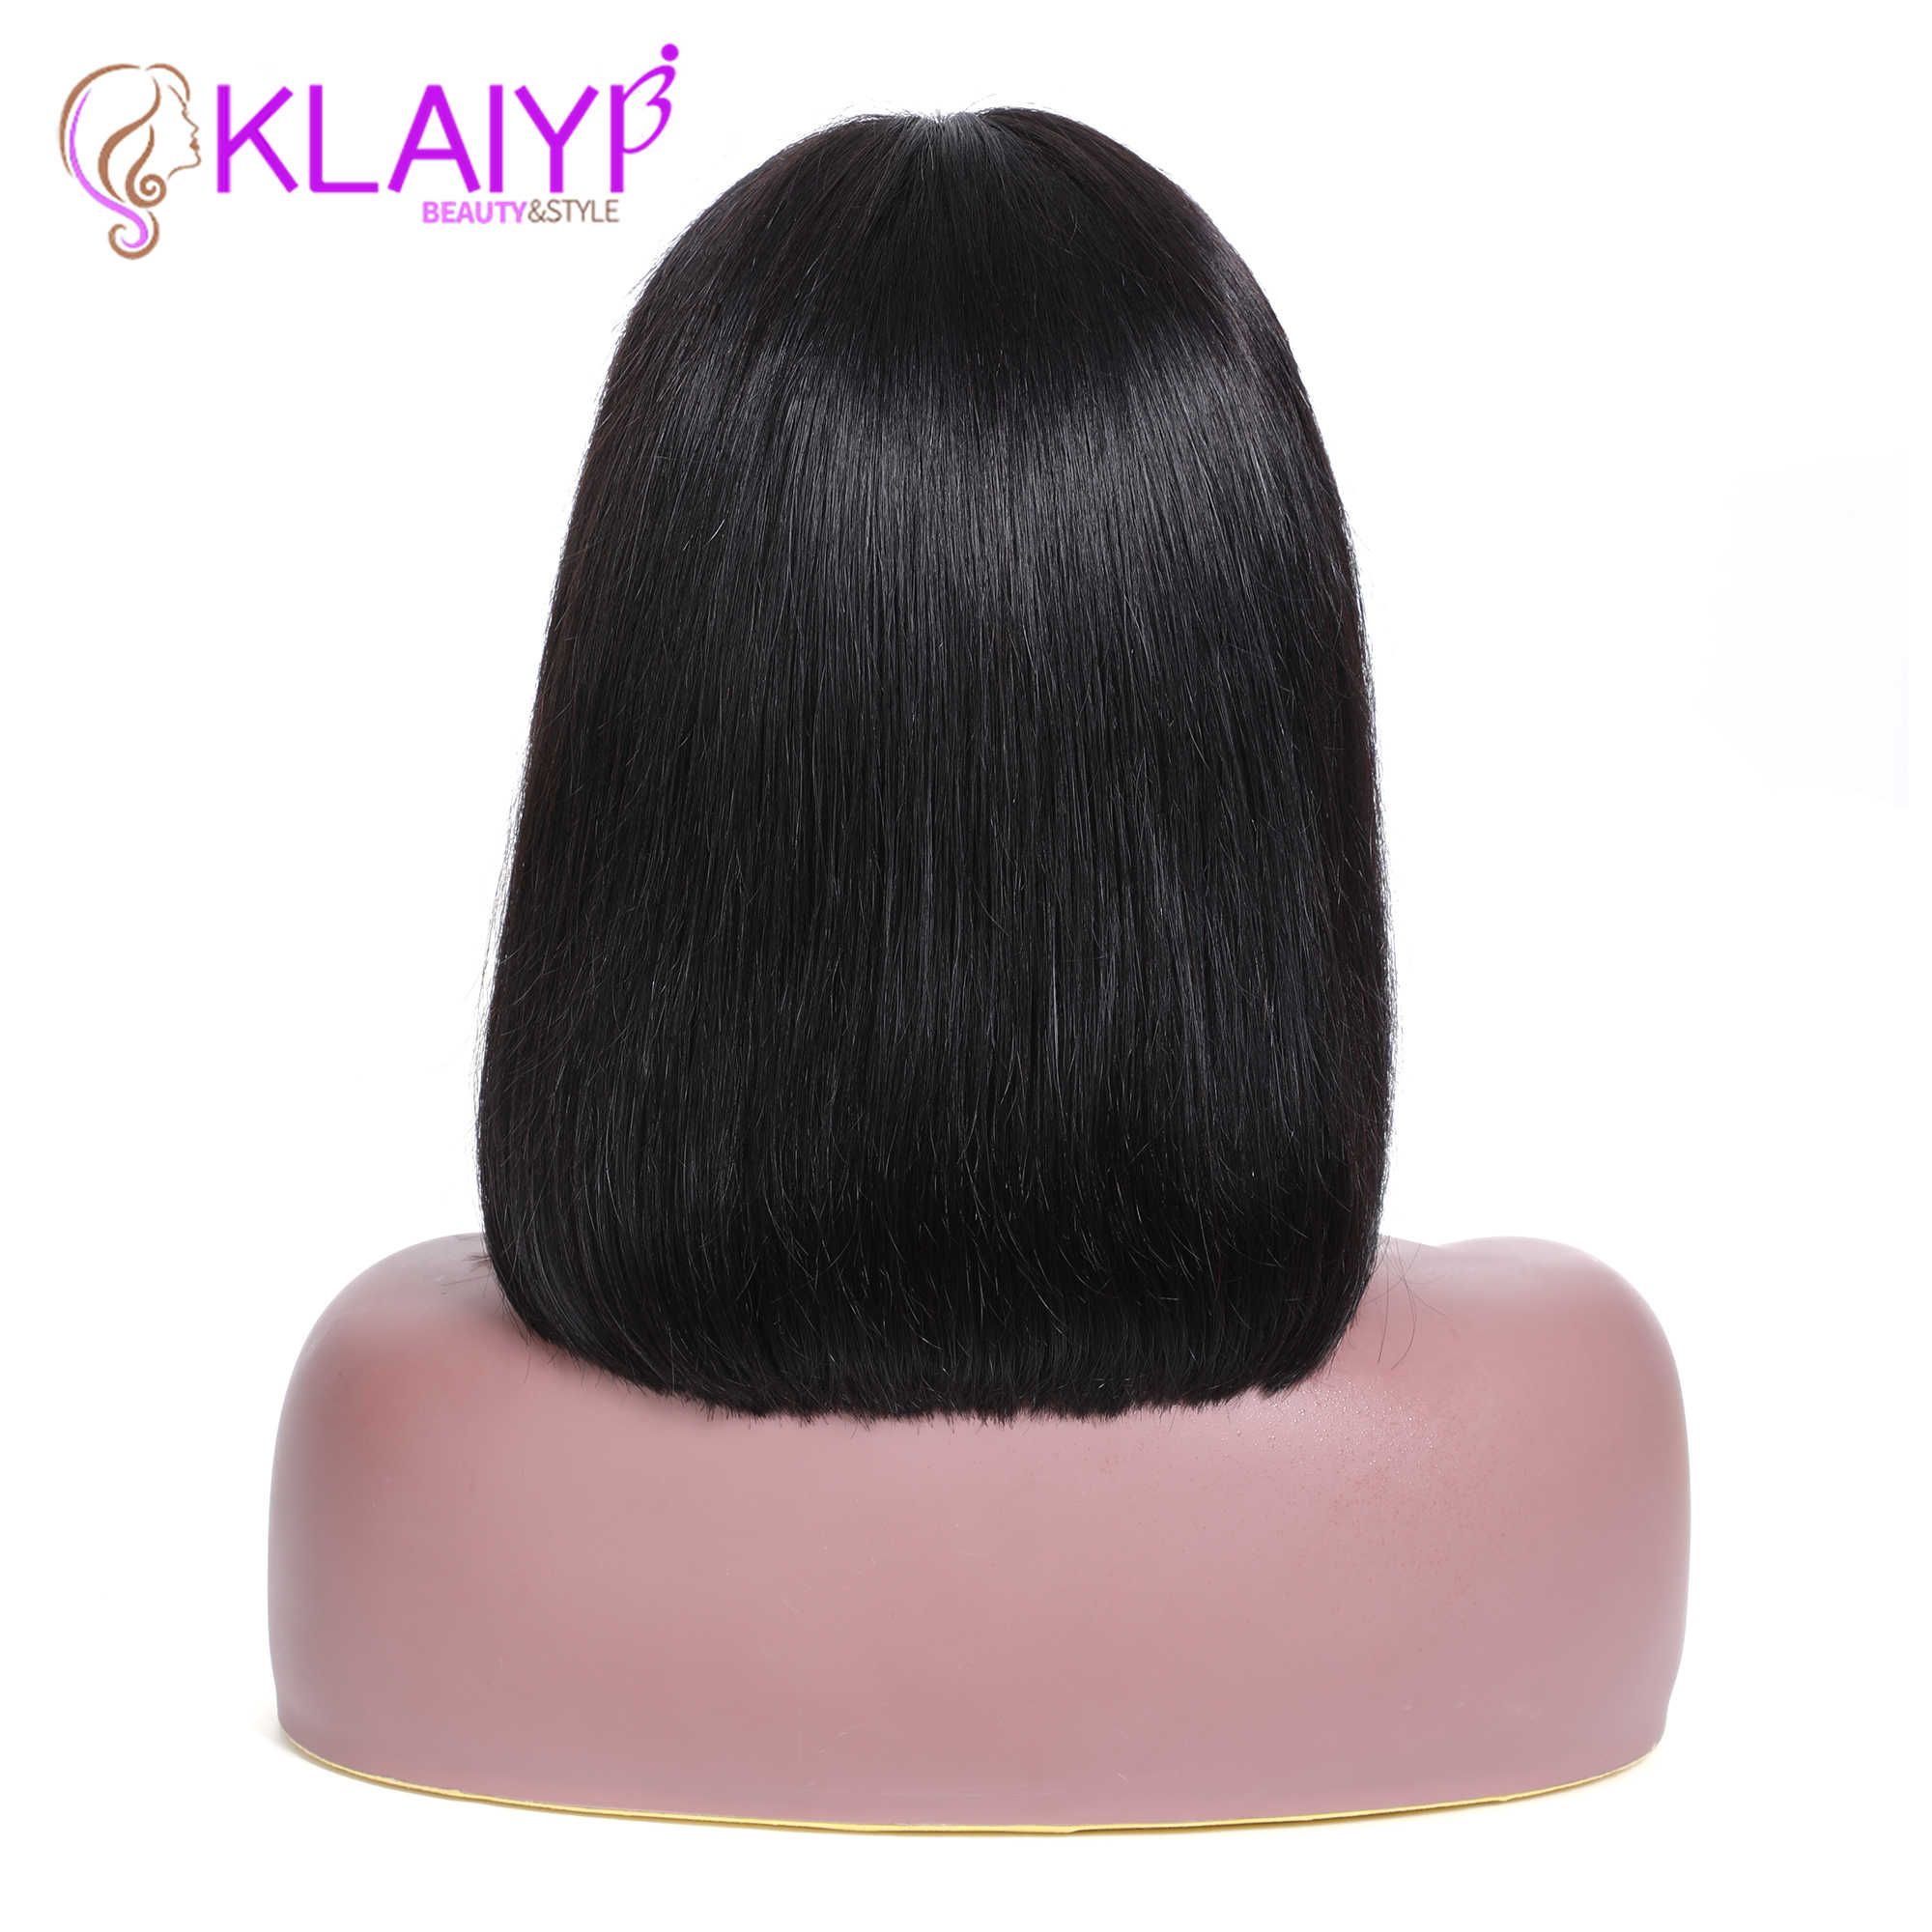 Klaiyi saç düz Bob İnsan saç peruk patlama ile 8-14 inç ön koparıp brezilyalı Remy saç 13*4 dantel ön peruk 150% yoğunluk